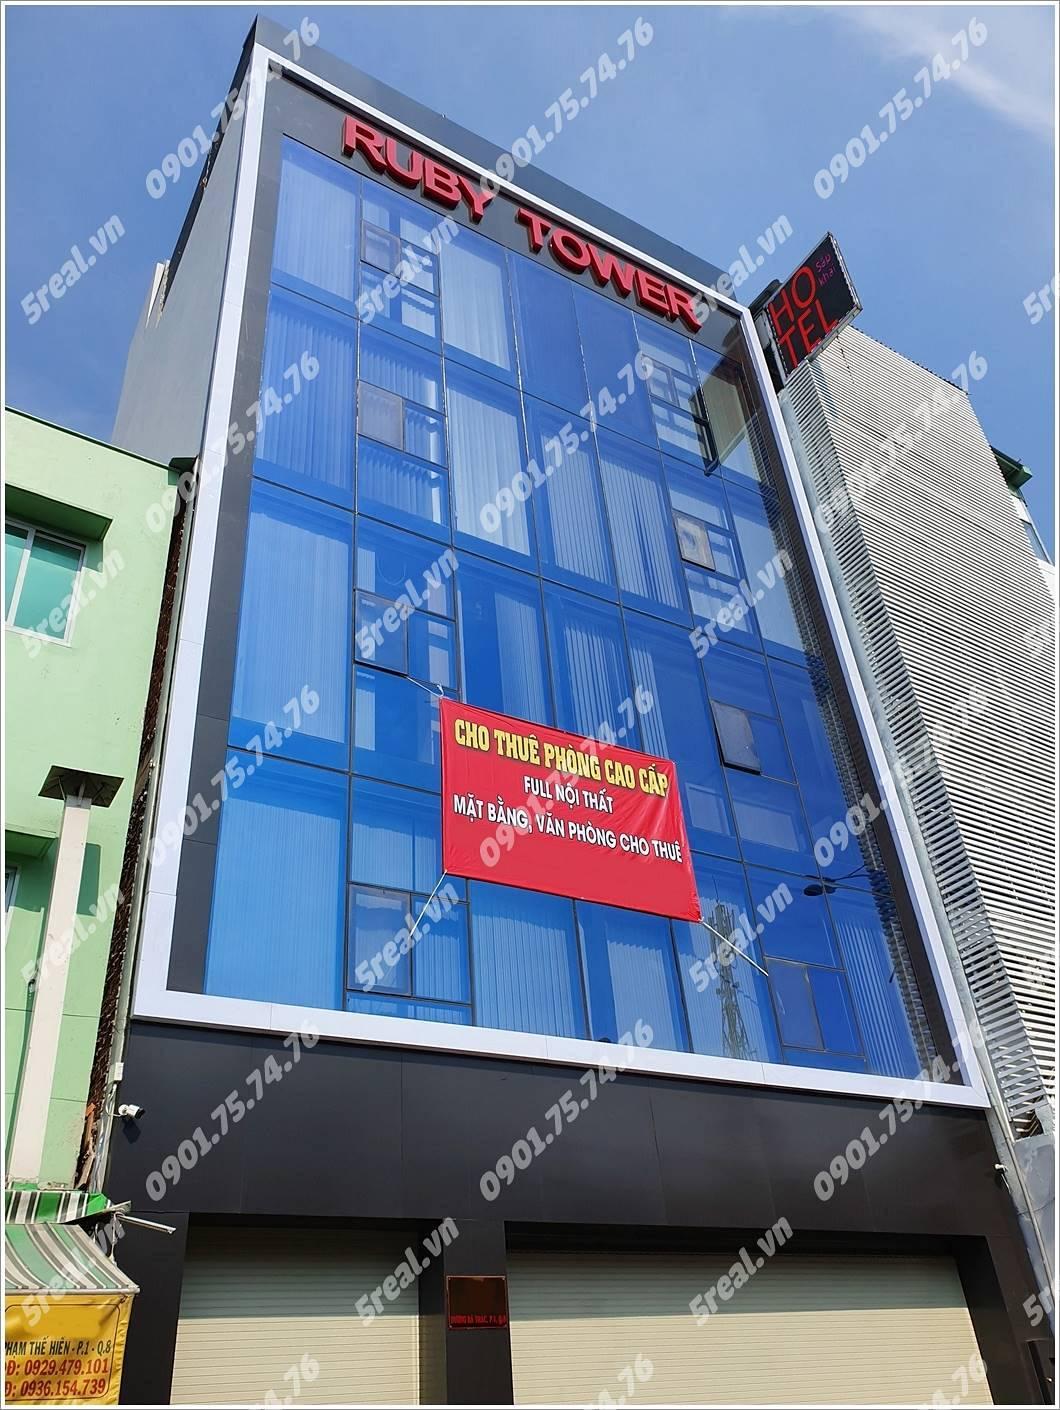 ruby-tower-duong-ba-trac-quan-8-van-phong-cho-thue-tphcm-5real.vn-01